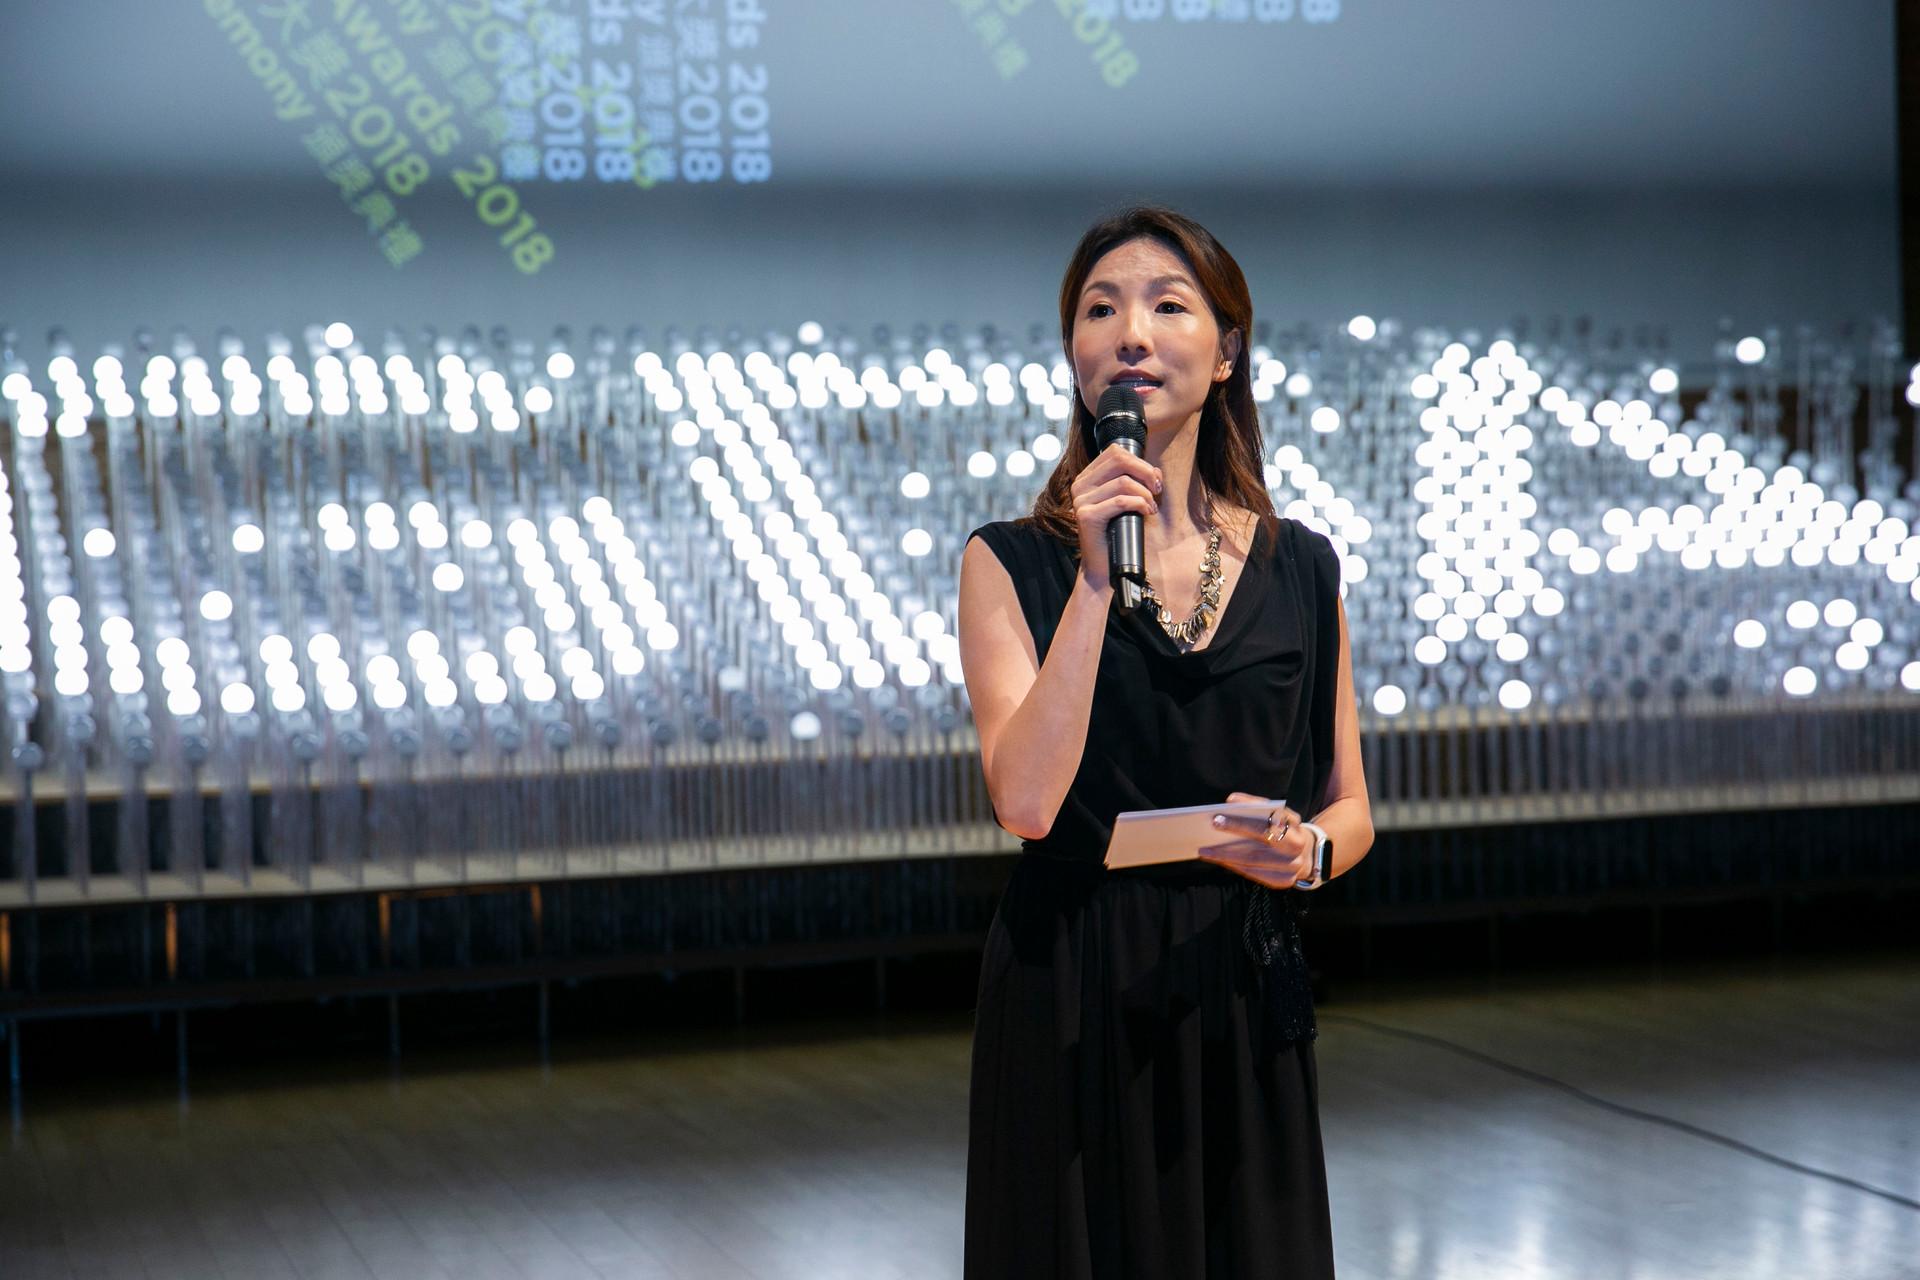 Asian women MC in black dress with microphone in HKDA Global Design Awards